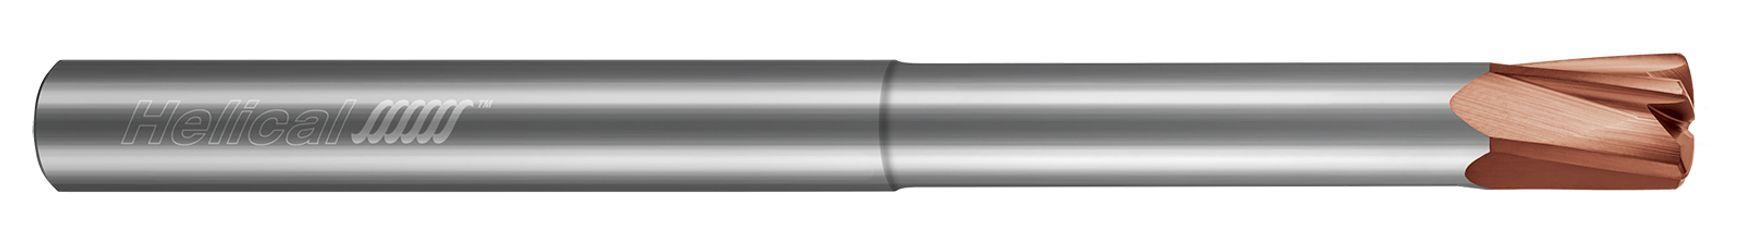 tool-details-82667